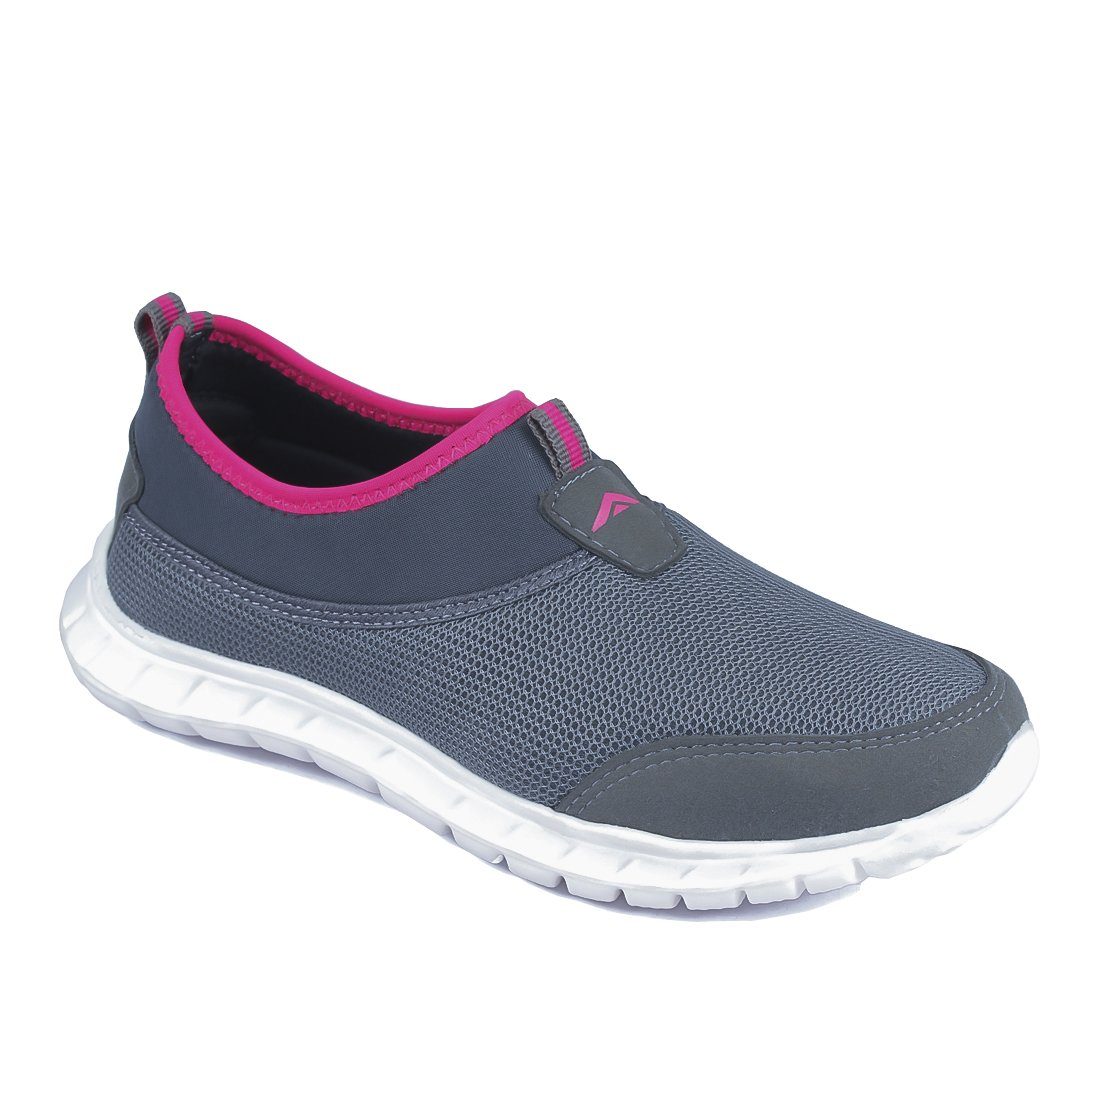 ASIAN Women's Running Shoes- Buy Online